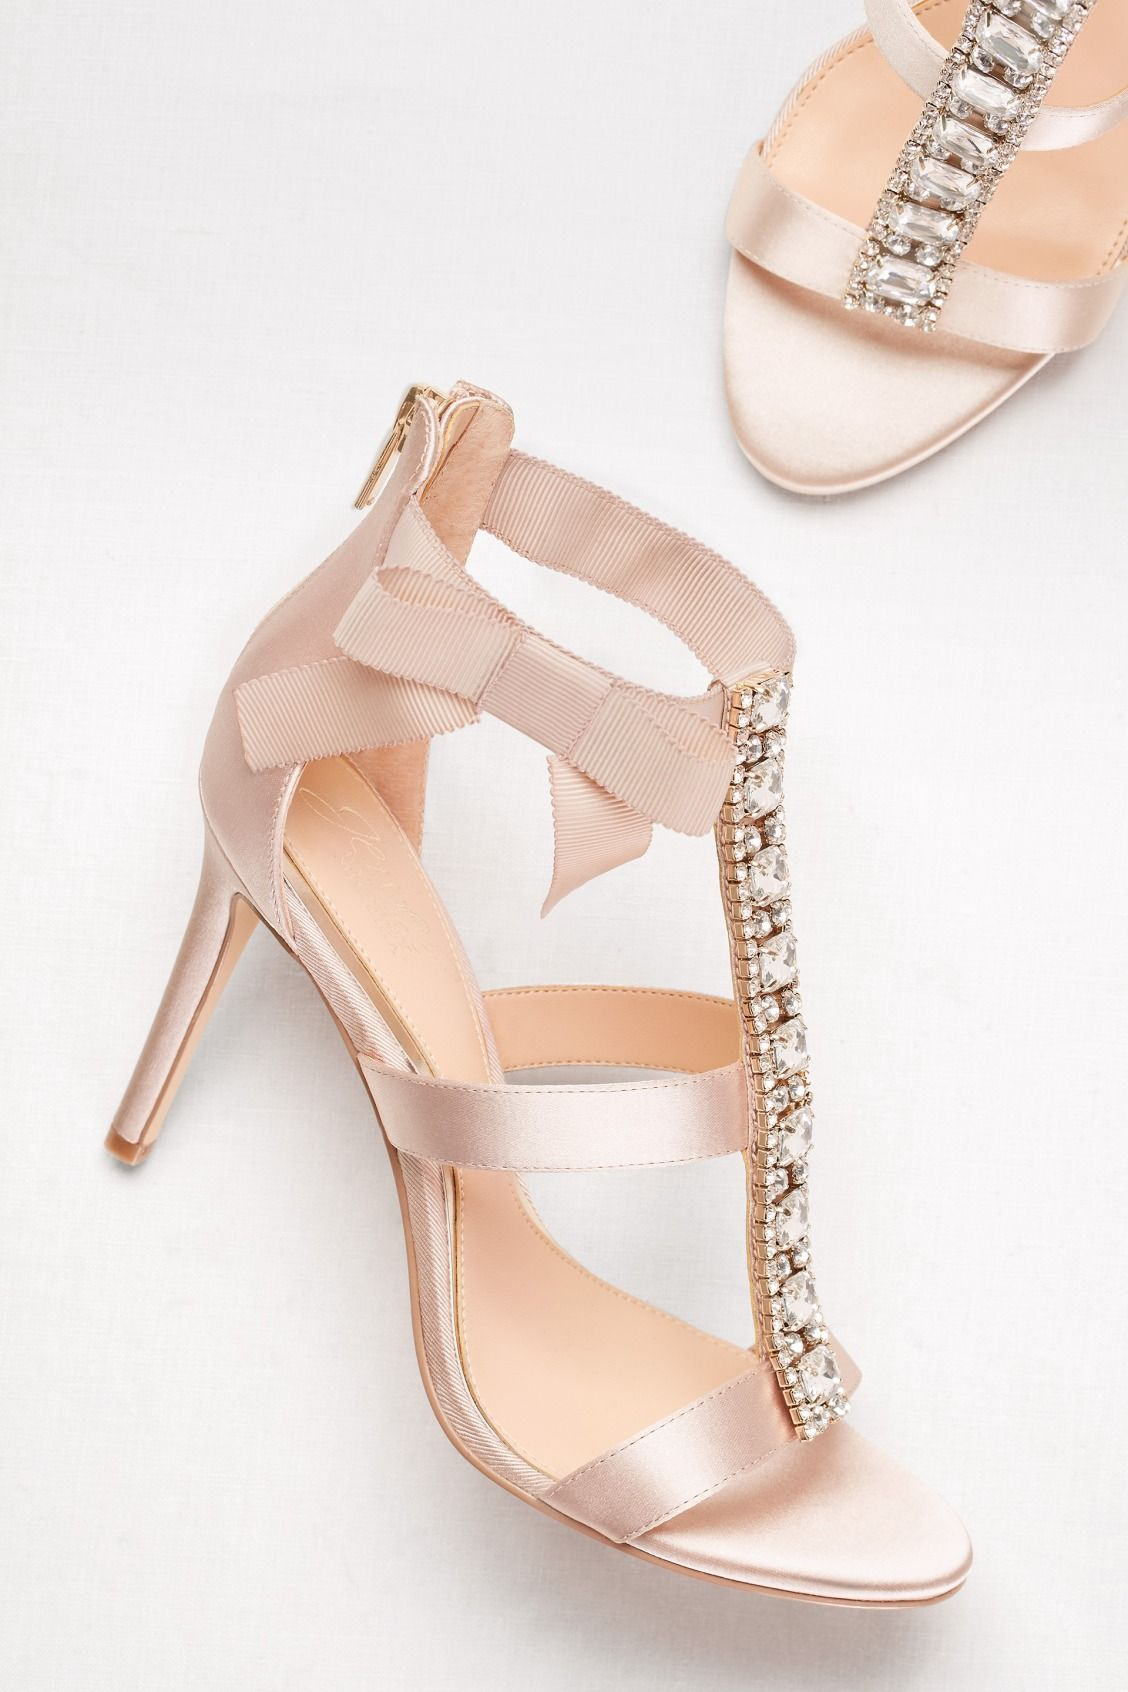 Embellished TStrap Heels with Grosgrain Bow Bridal